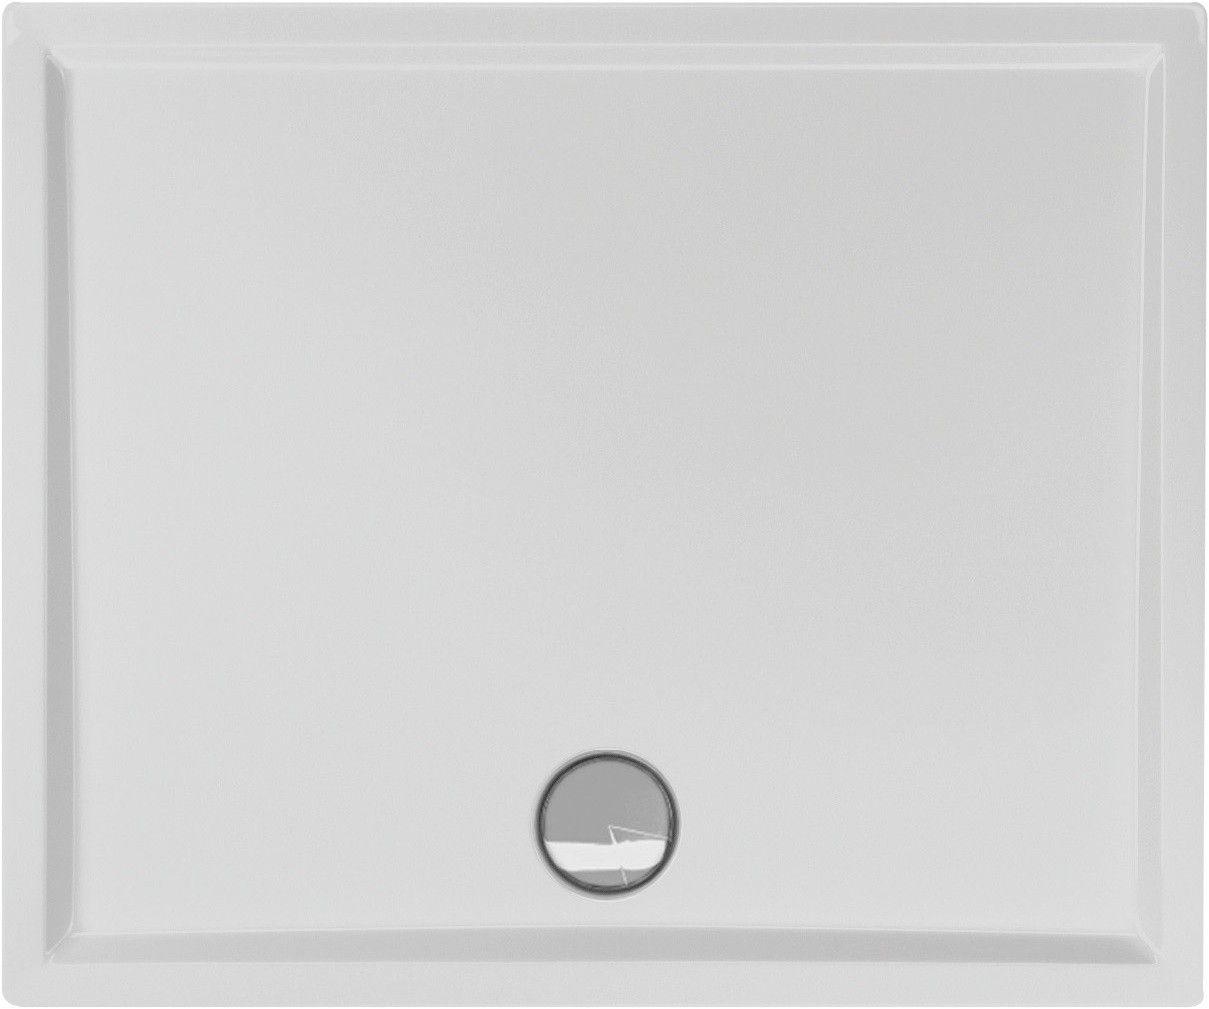 Duschwanne Flach 130 X 100 X 4 Cm Duschwanne Flach Wannentrager